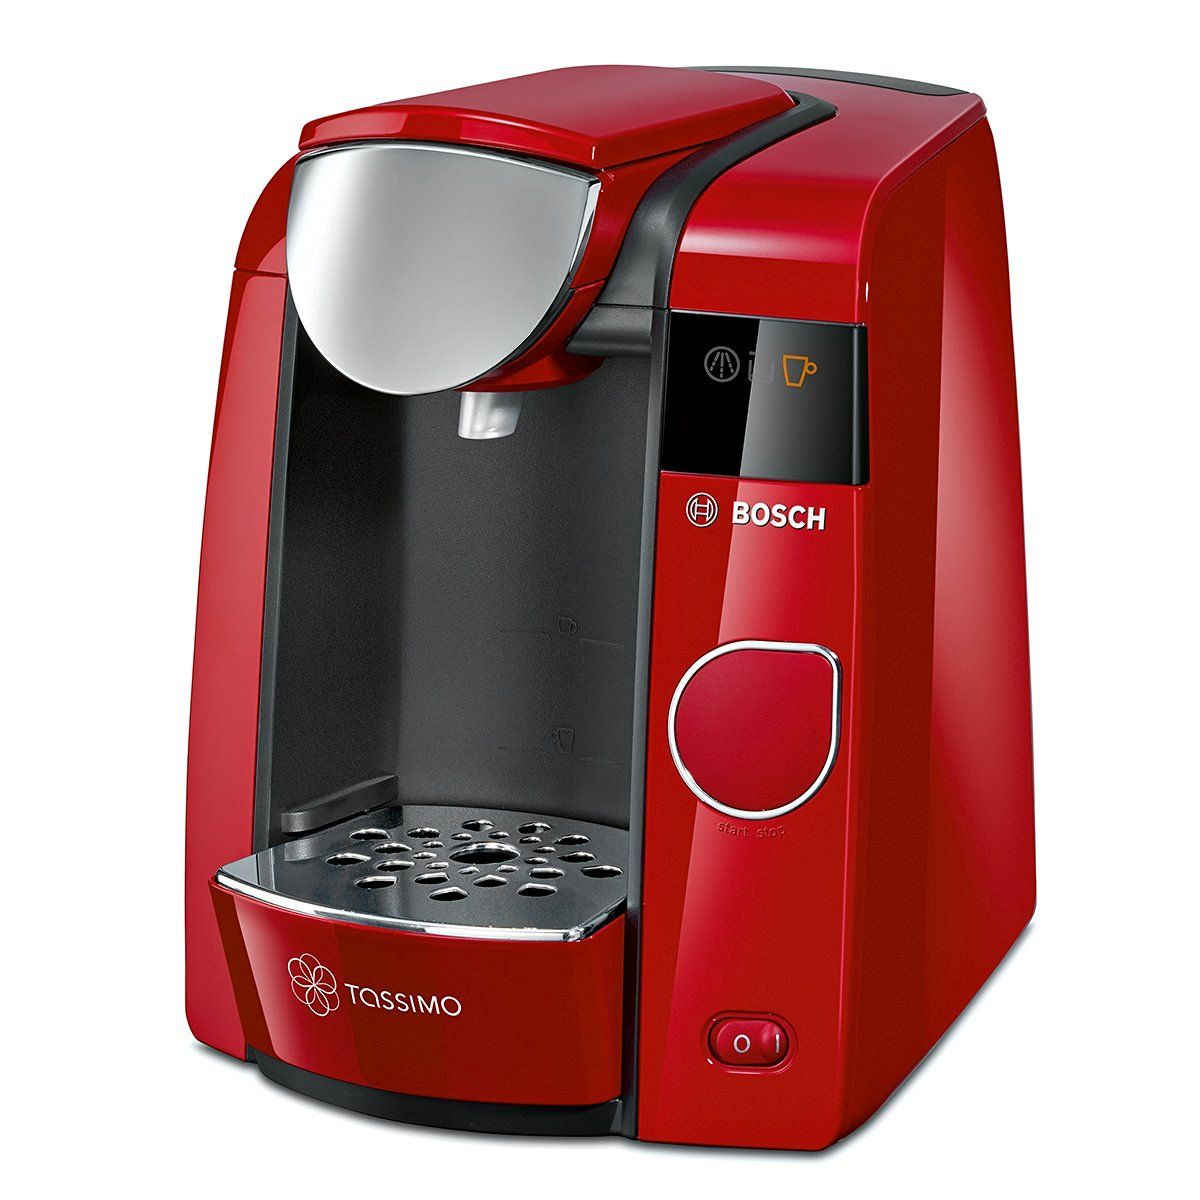 Bosch TAS4503 coffee maker coffee makers (freestanding